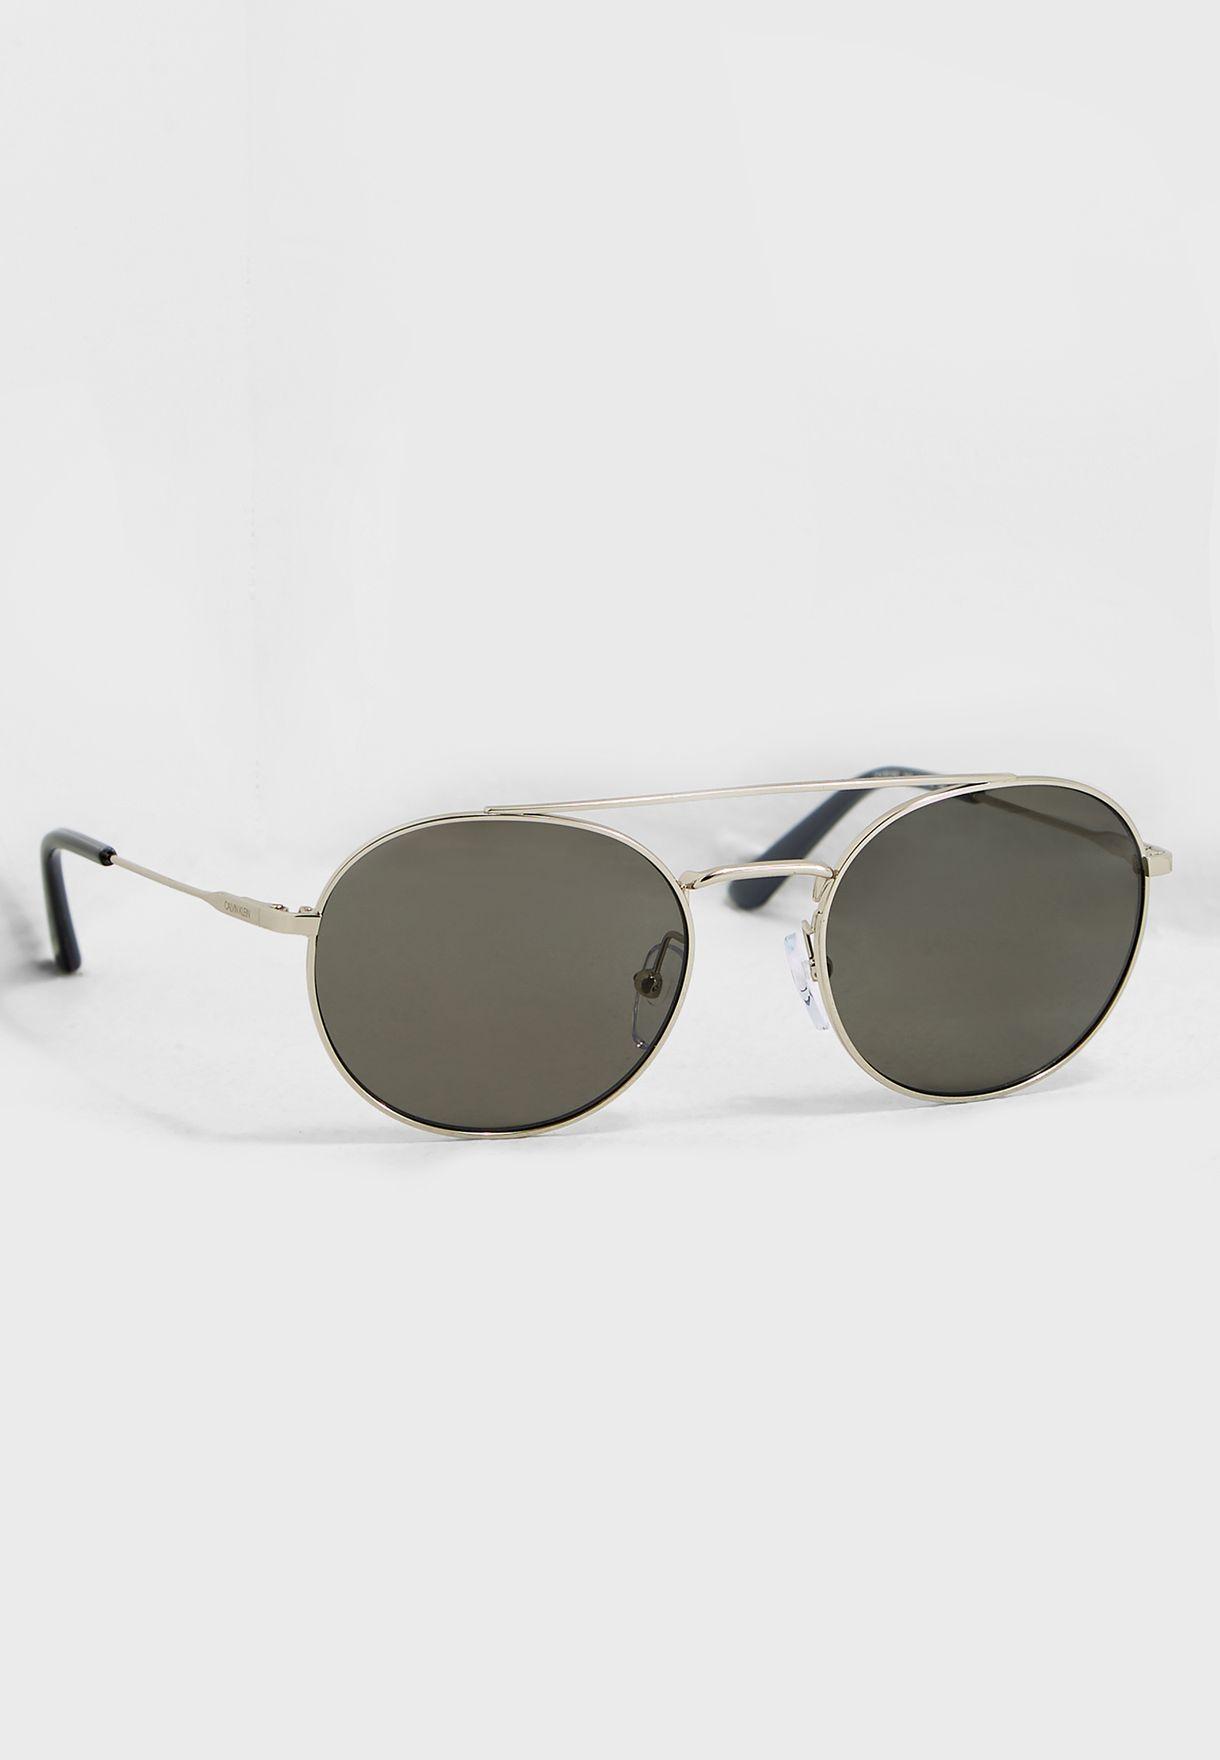 00a059f76c94 Shop Calvin Klein silver Round Sunglasses CK18116S-045 for Men in ...